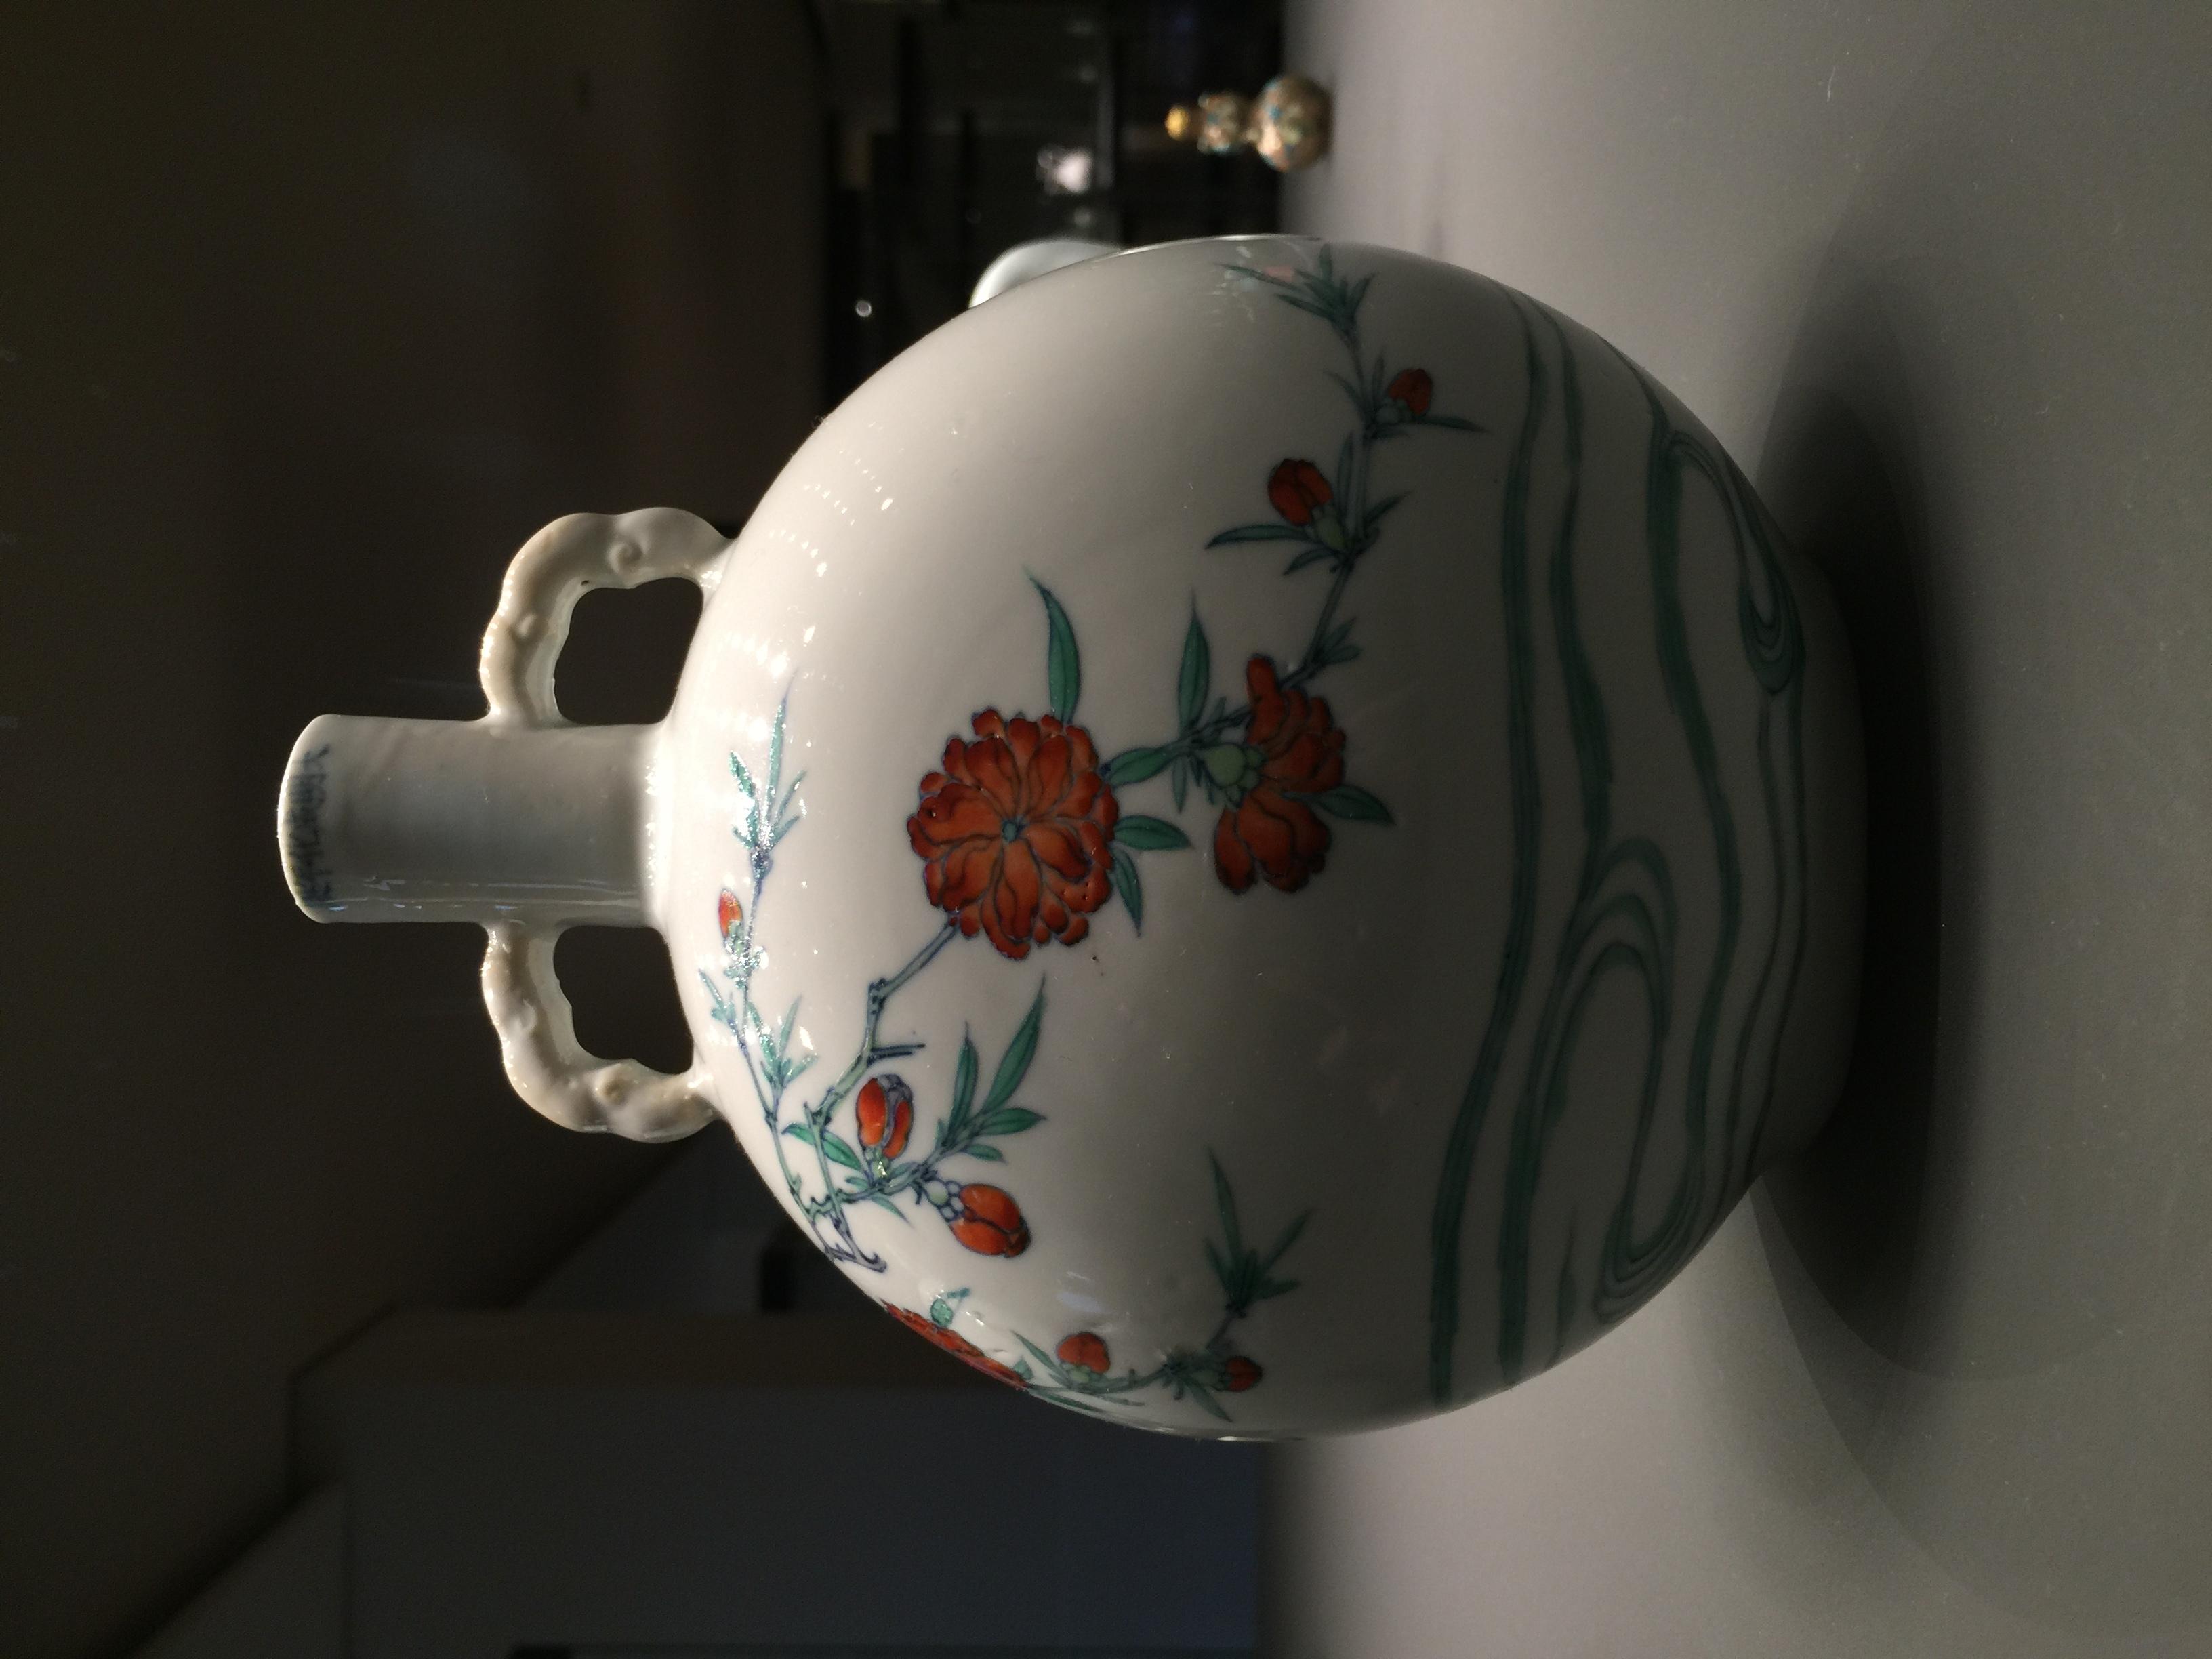 Chinese-Porcelain-British-Museum-Percival-David-jessewaugh.com-117.jpg